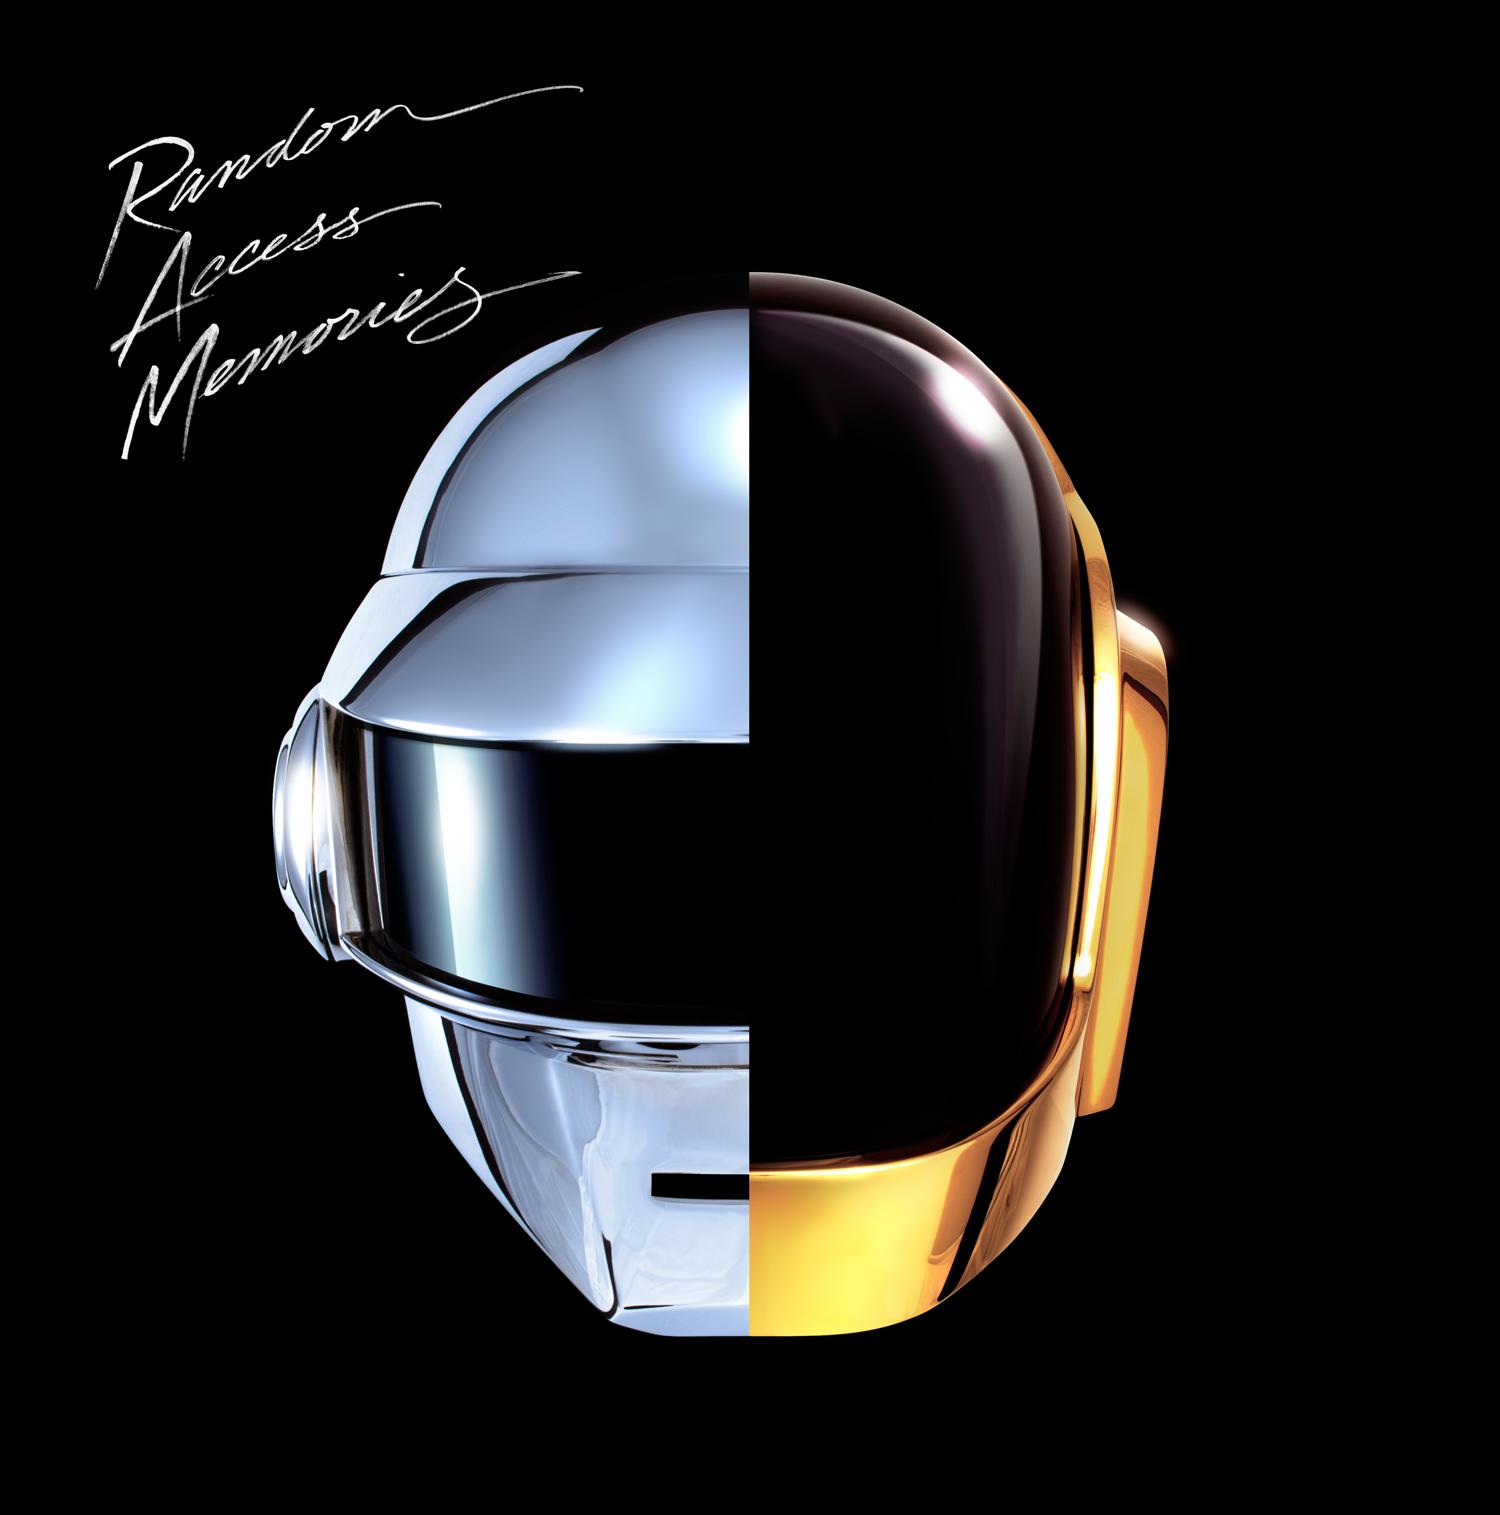 Daft Punk Announce Random Access Memories Amp Cd Vinyl Pre